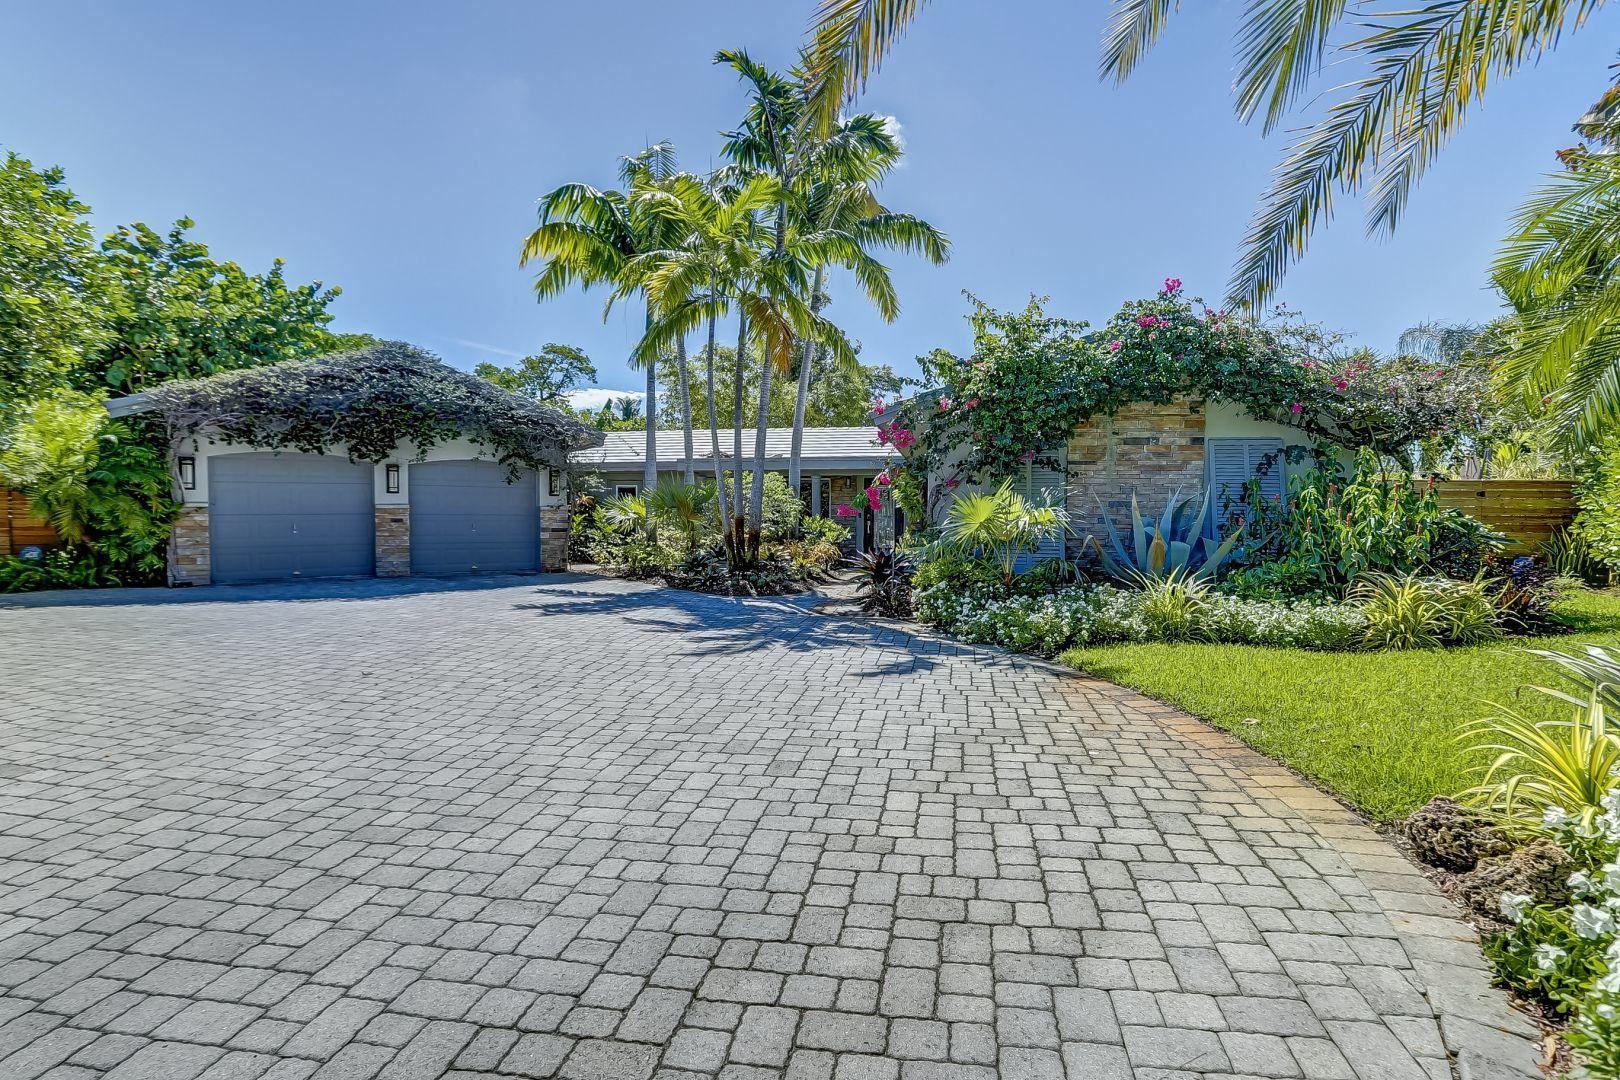 1948 NE 7th Terrace, Wilton Manors, FL 33305 - #: RX-10651686